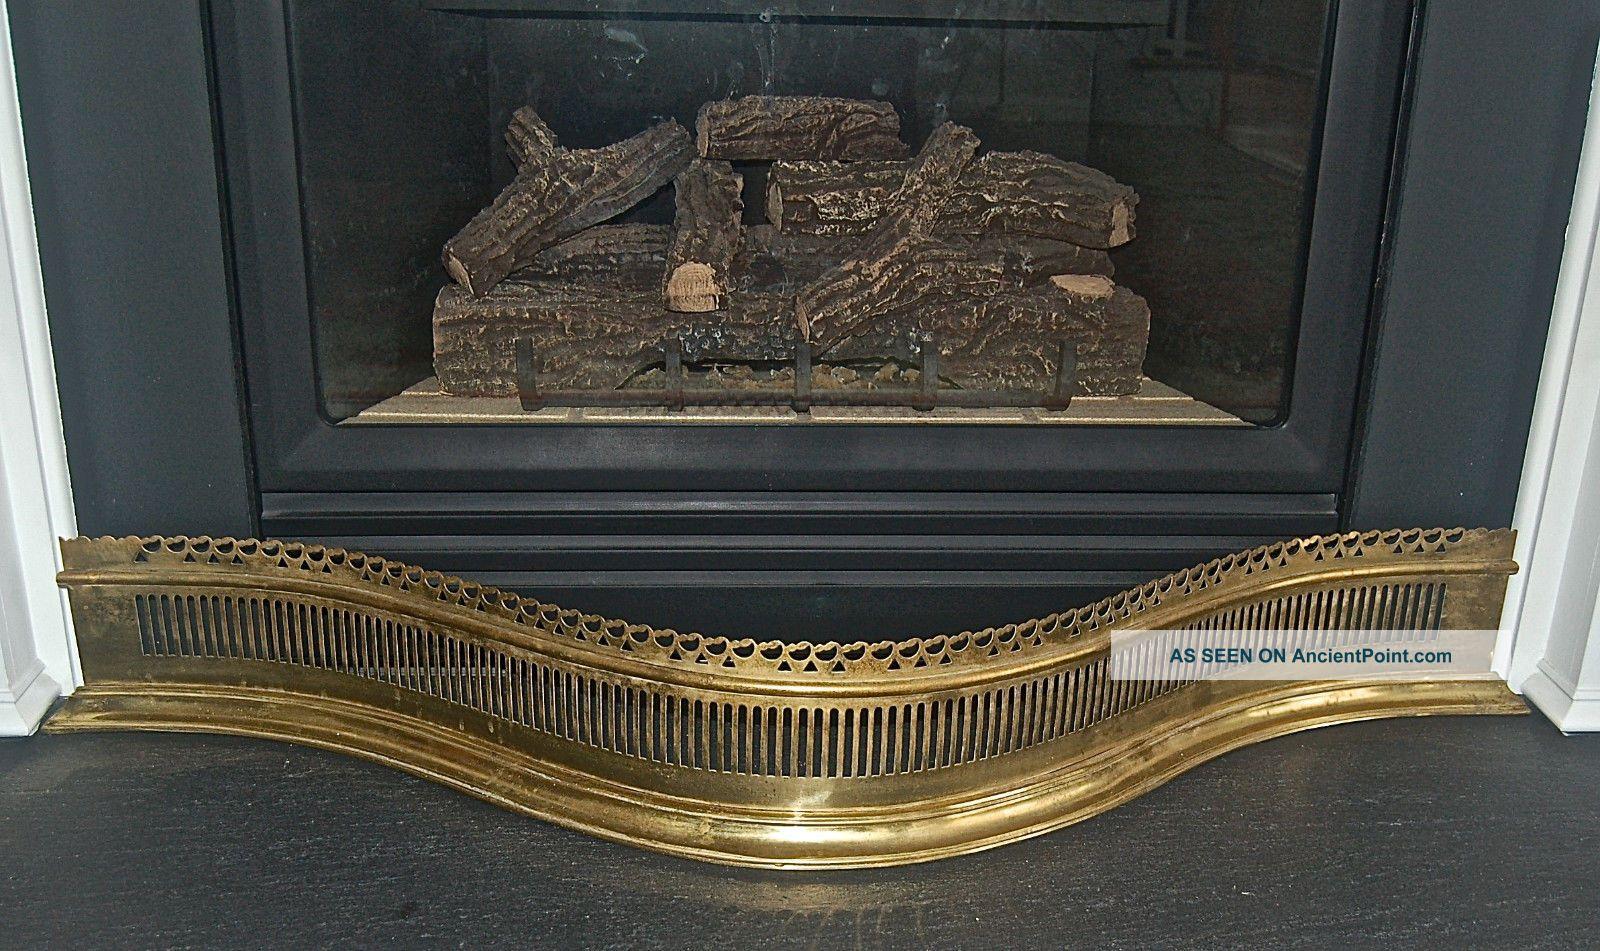 Virginia Metalcrafters Serpentine Pierced Brass Fireplace Fender 102 - 1 Hearth Ware photo